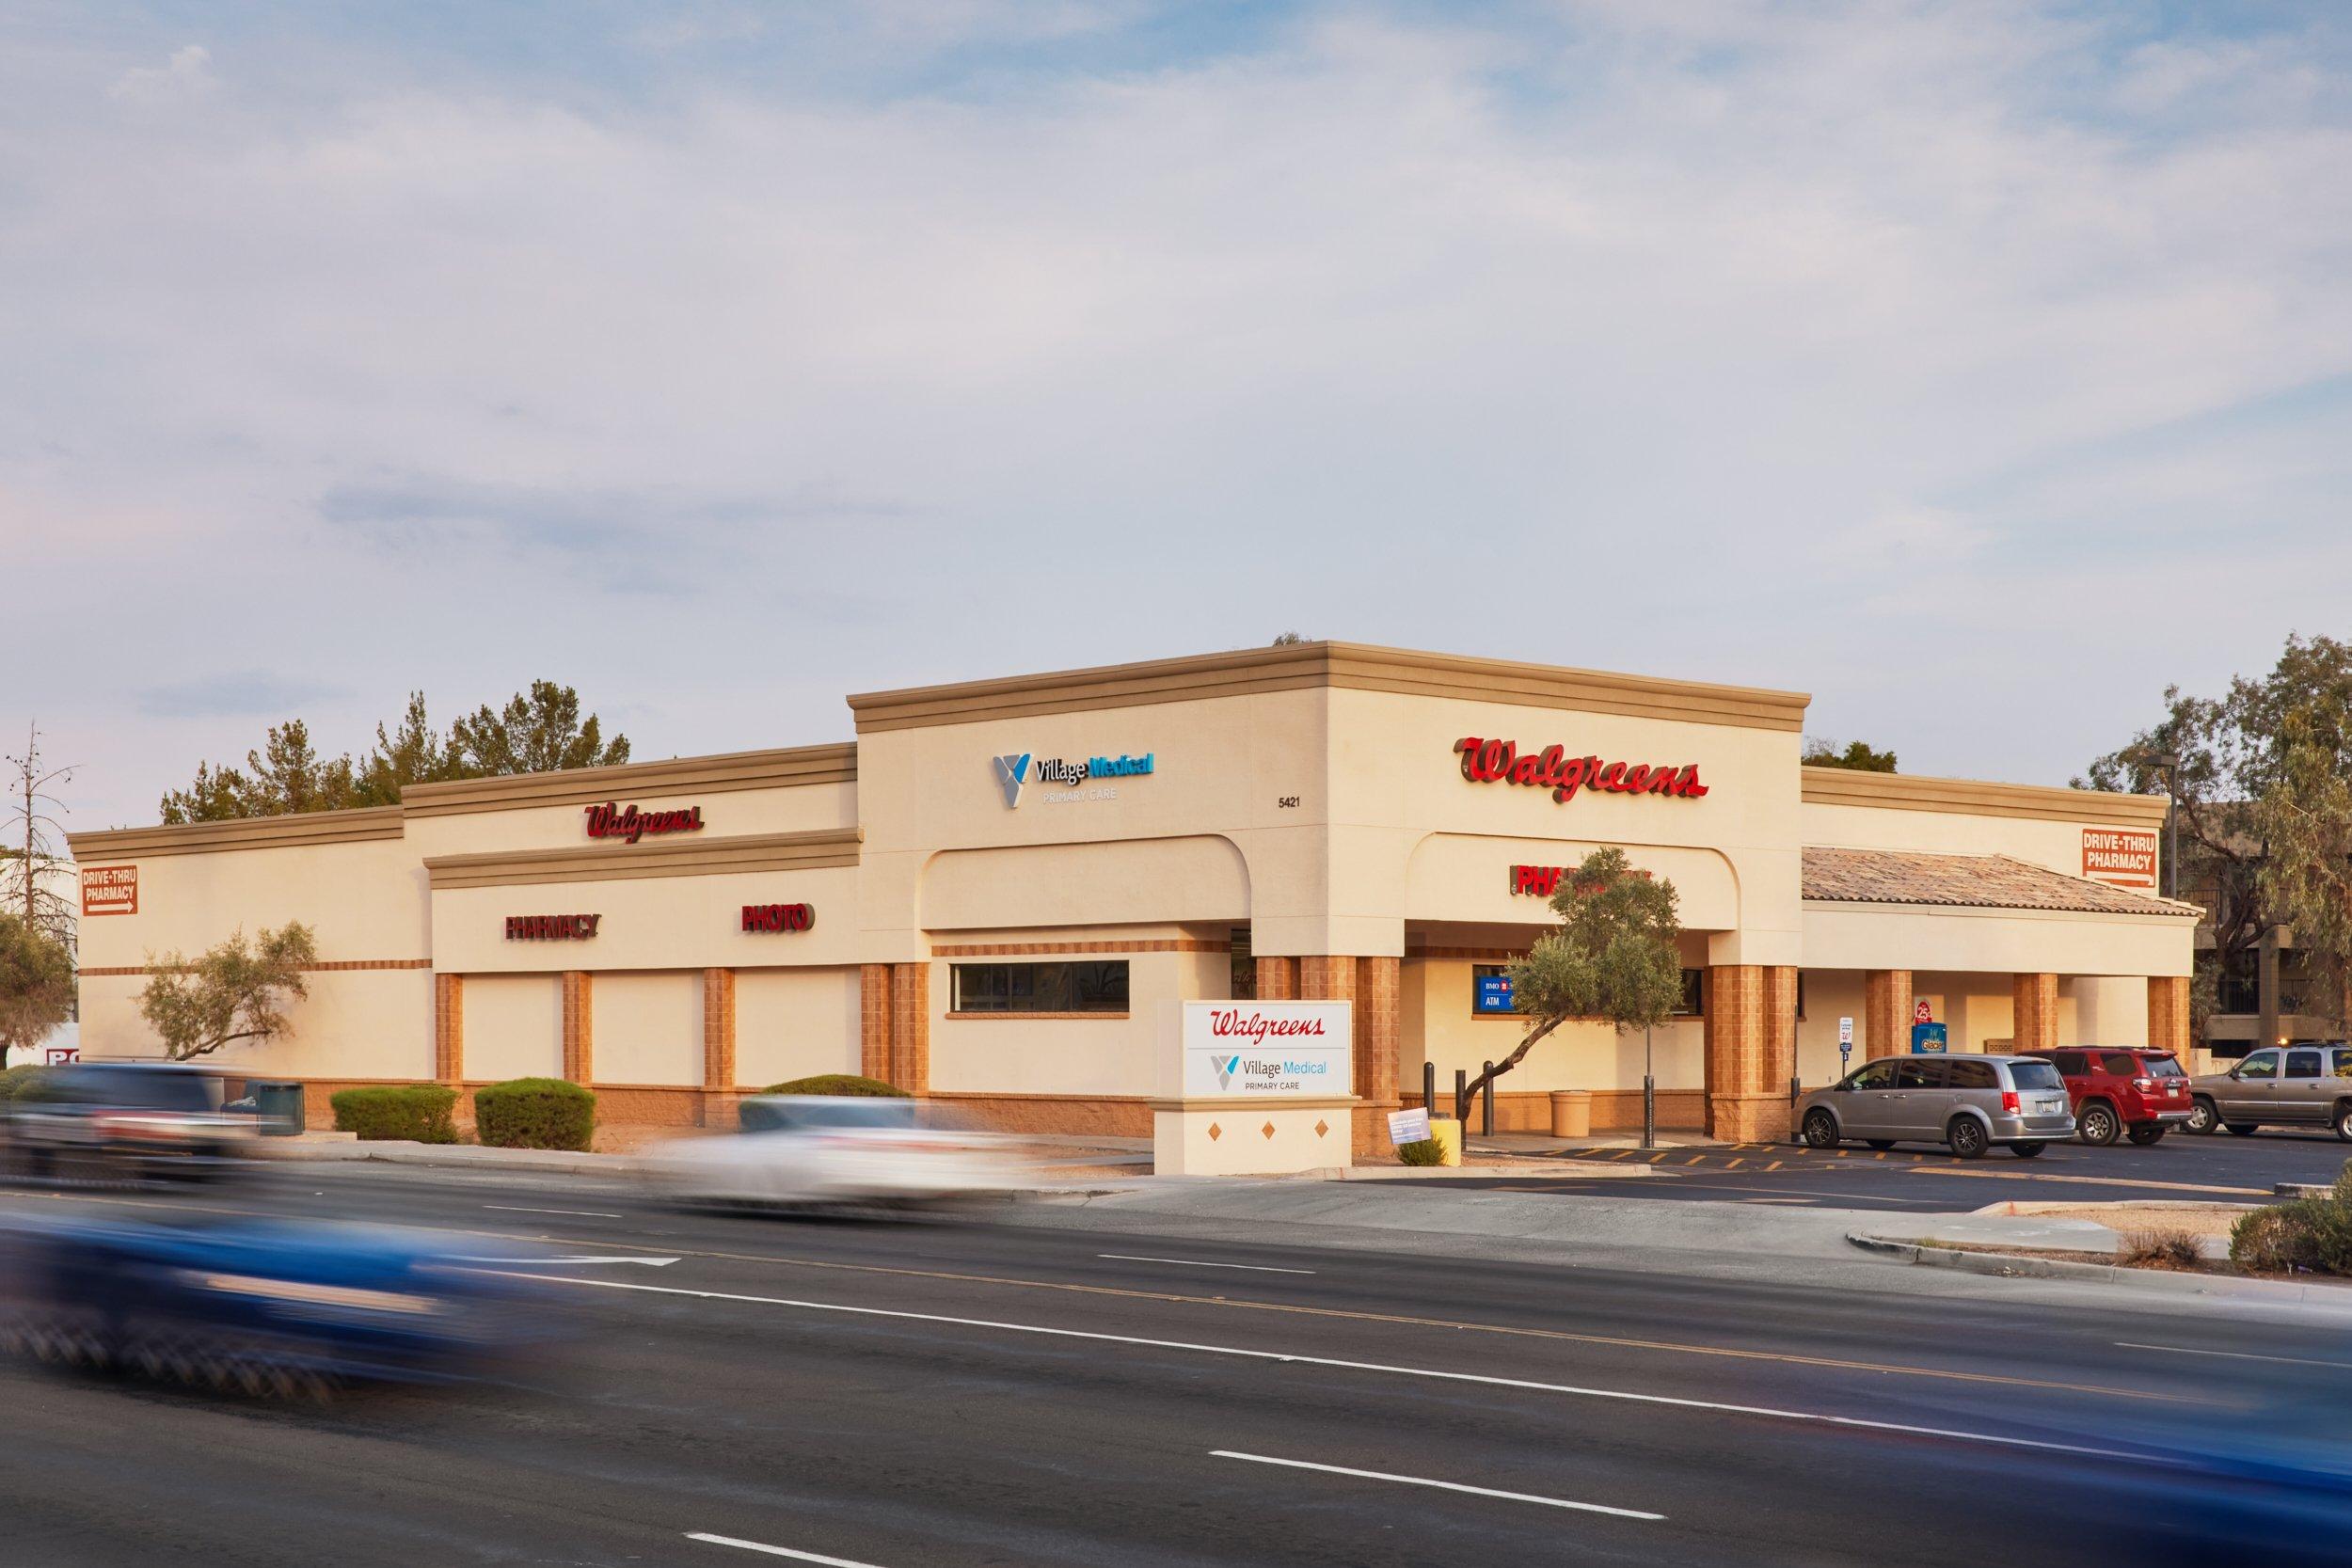 Village Medical at Walgreens - 5421 W. Thunderbird Rd., Suite. 110 Glendale, AZ, 85306.